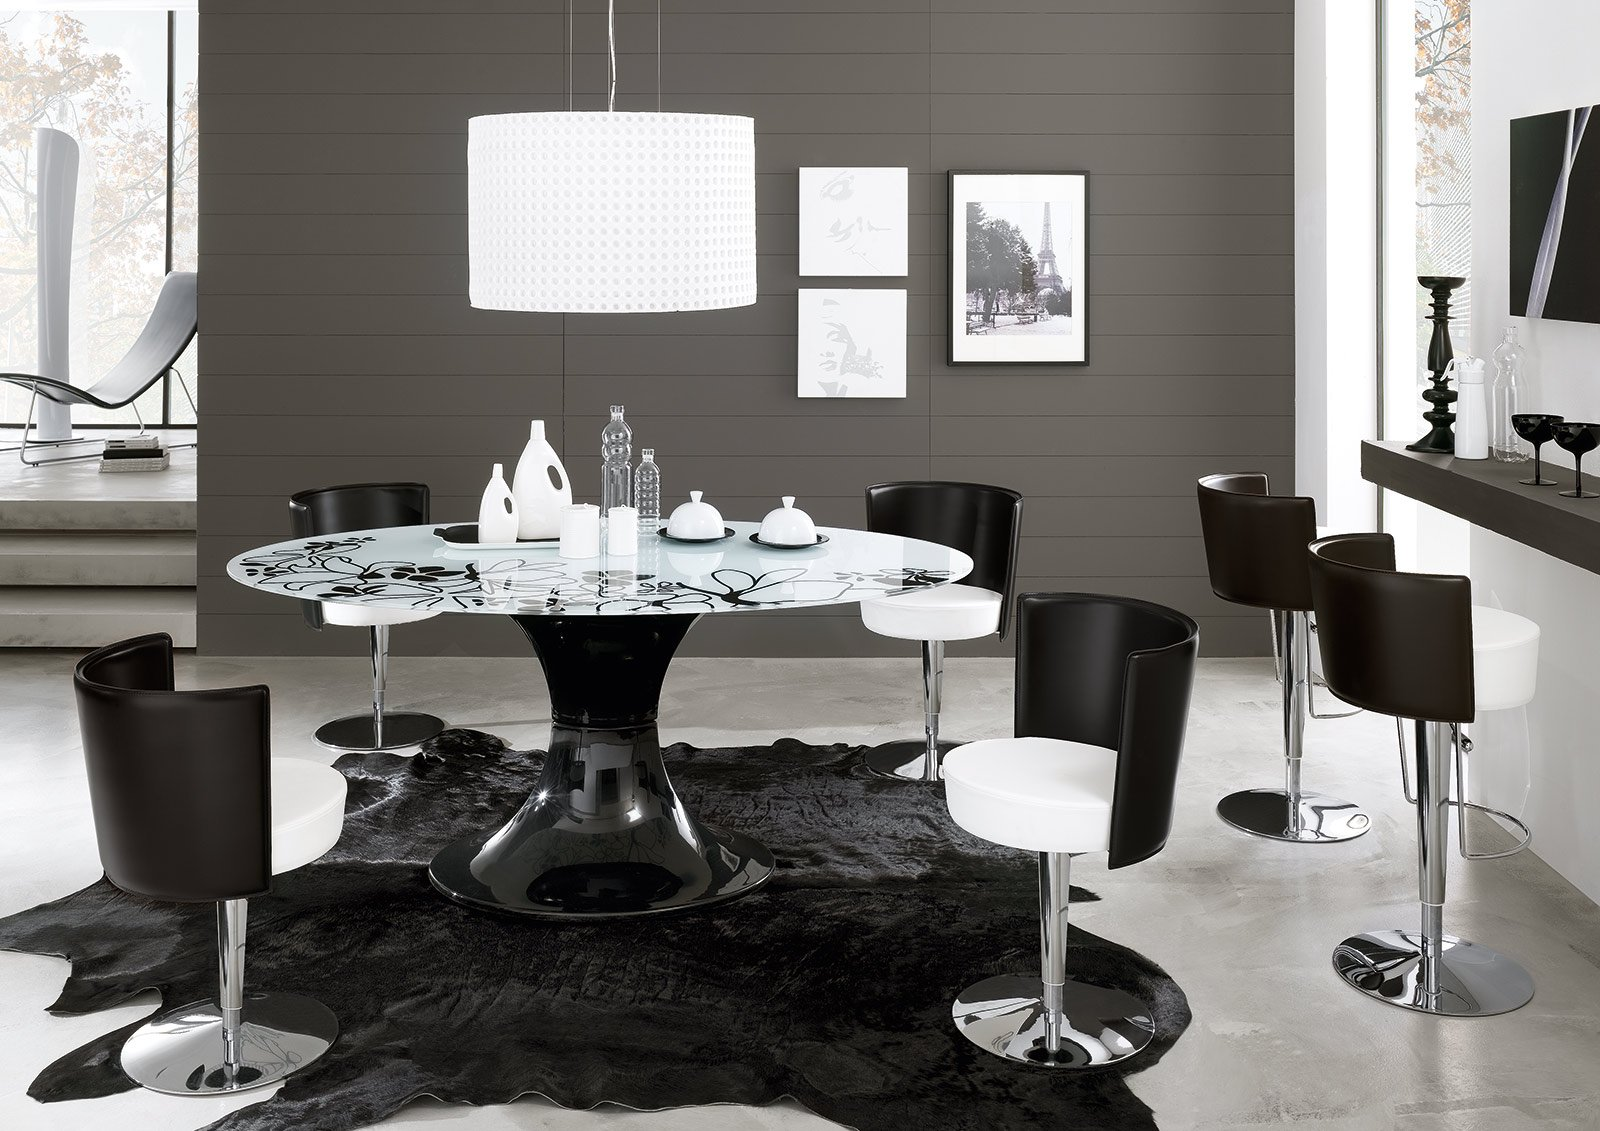 Tavoli rotondi e ovali: design morbido, minimal, dinamico - Cose ...